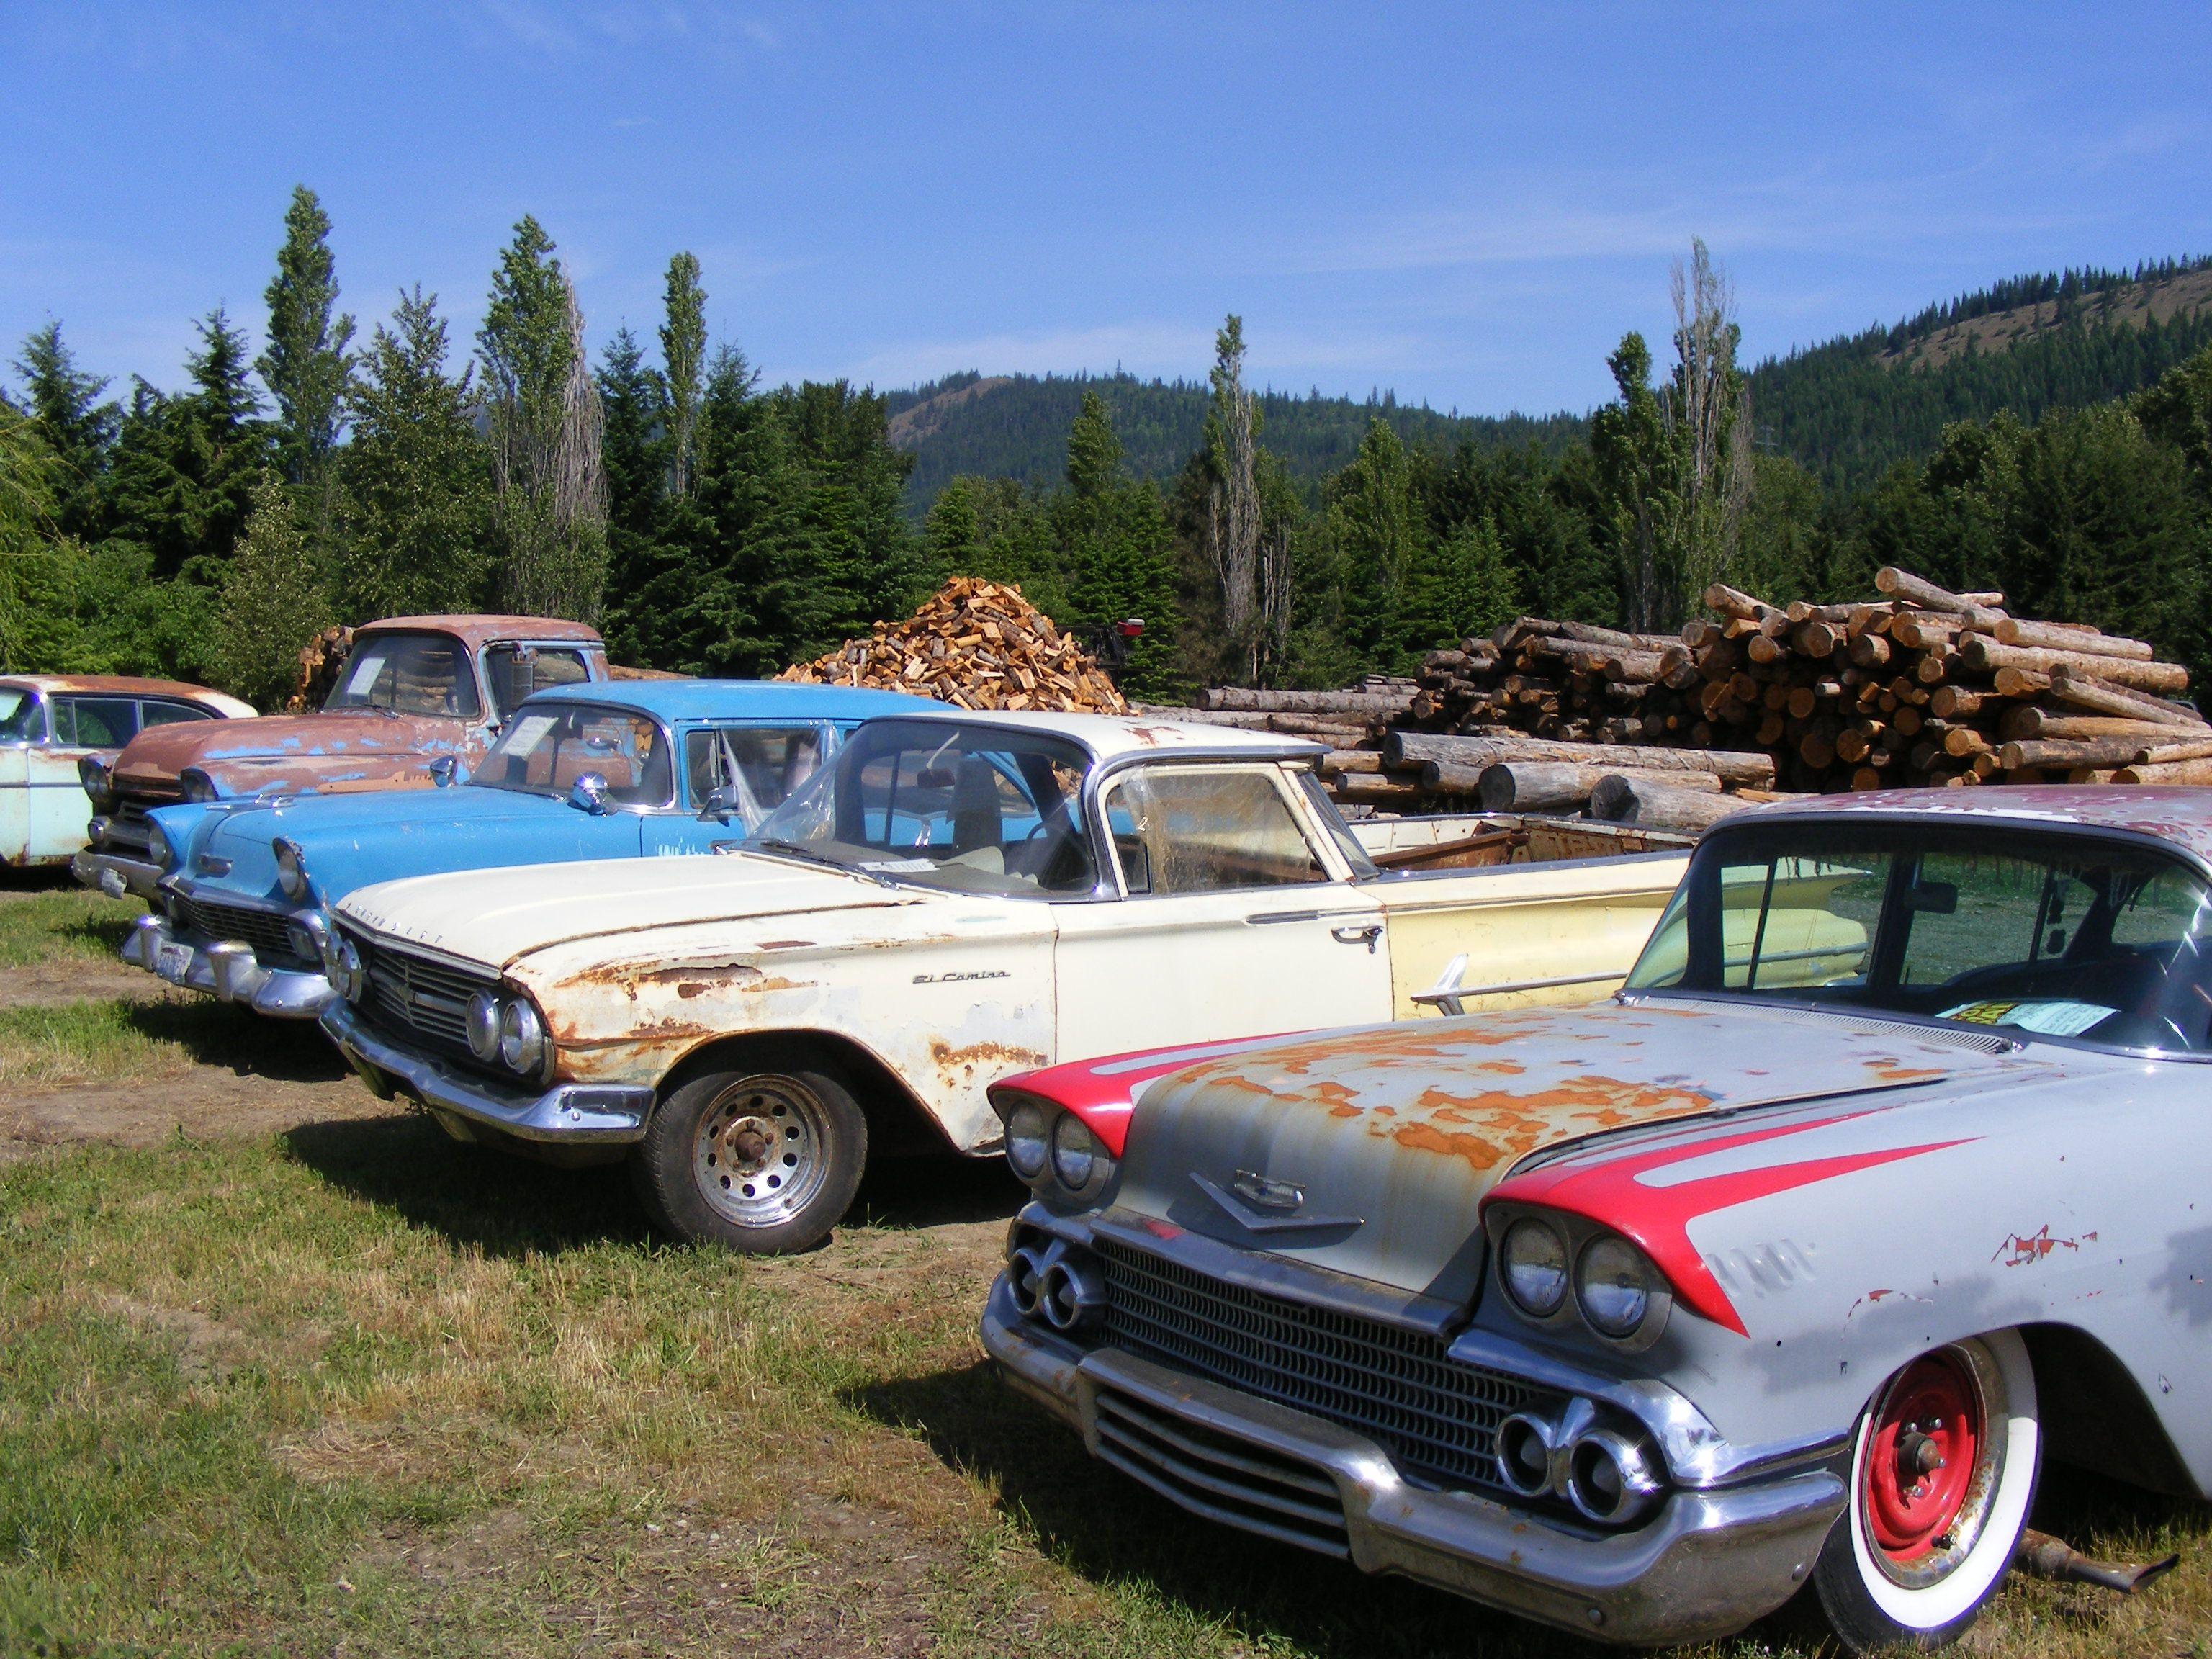 For Sale Classic Chevy classic cars trucks el camenos Easton/CleElum ...